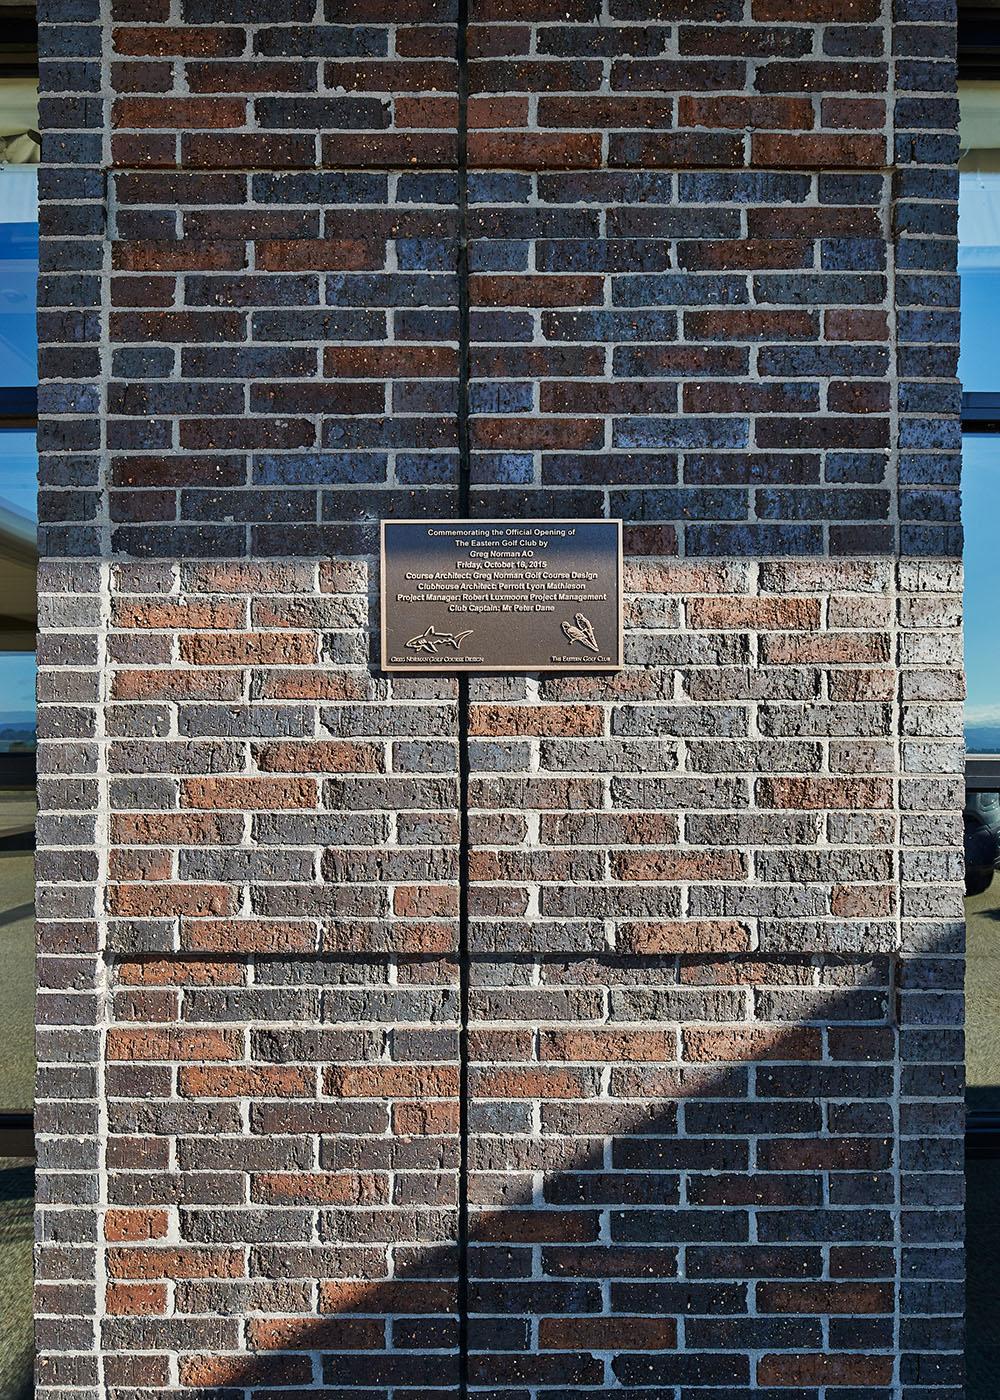 webres 2 170629 Krause Bricks 0376.jpg